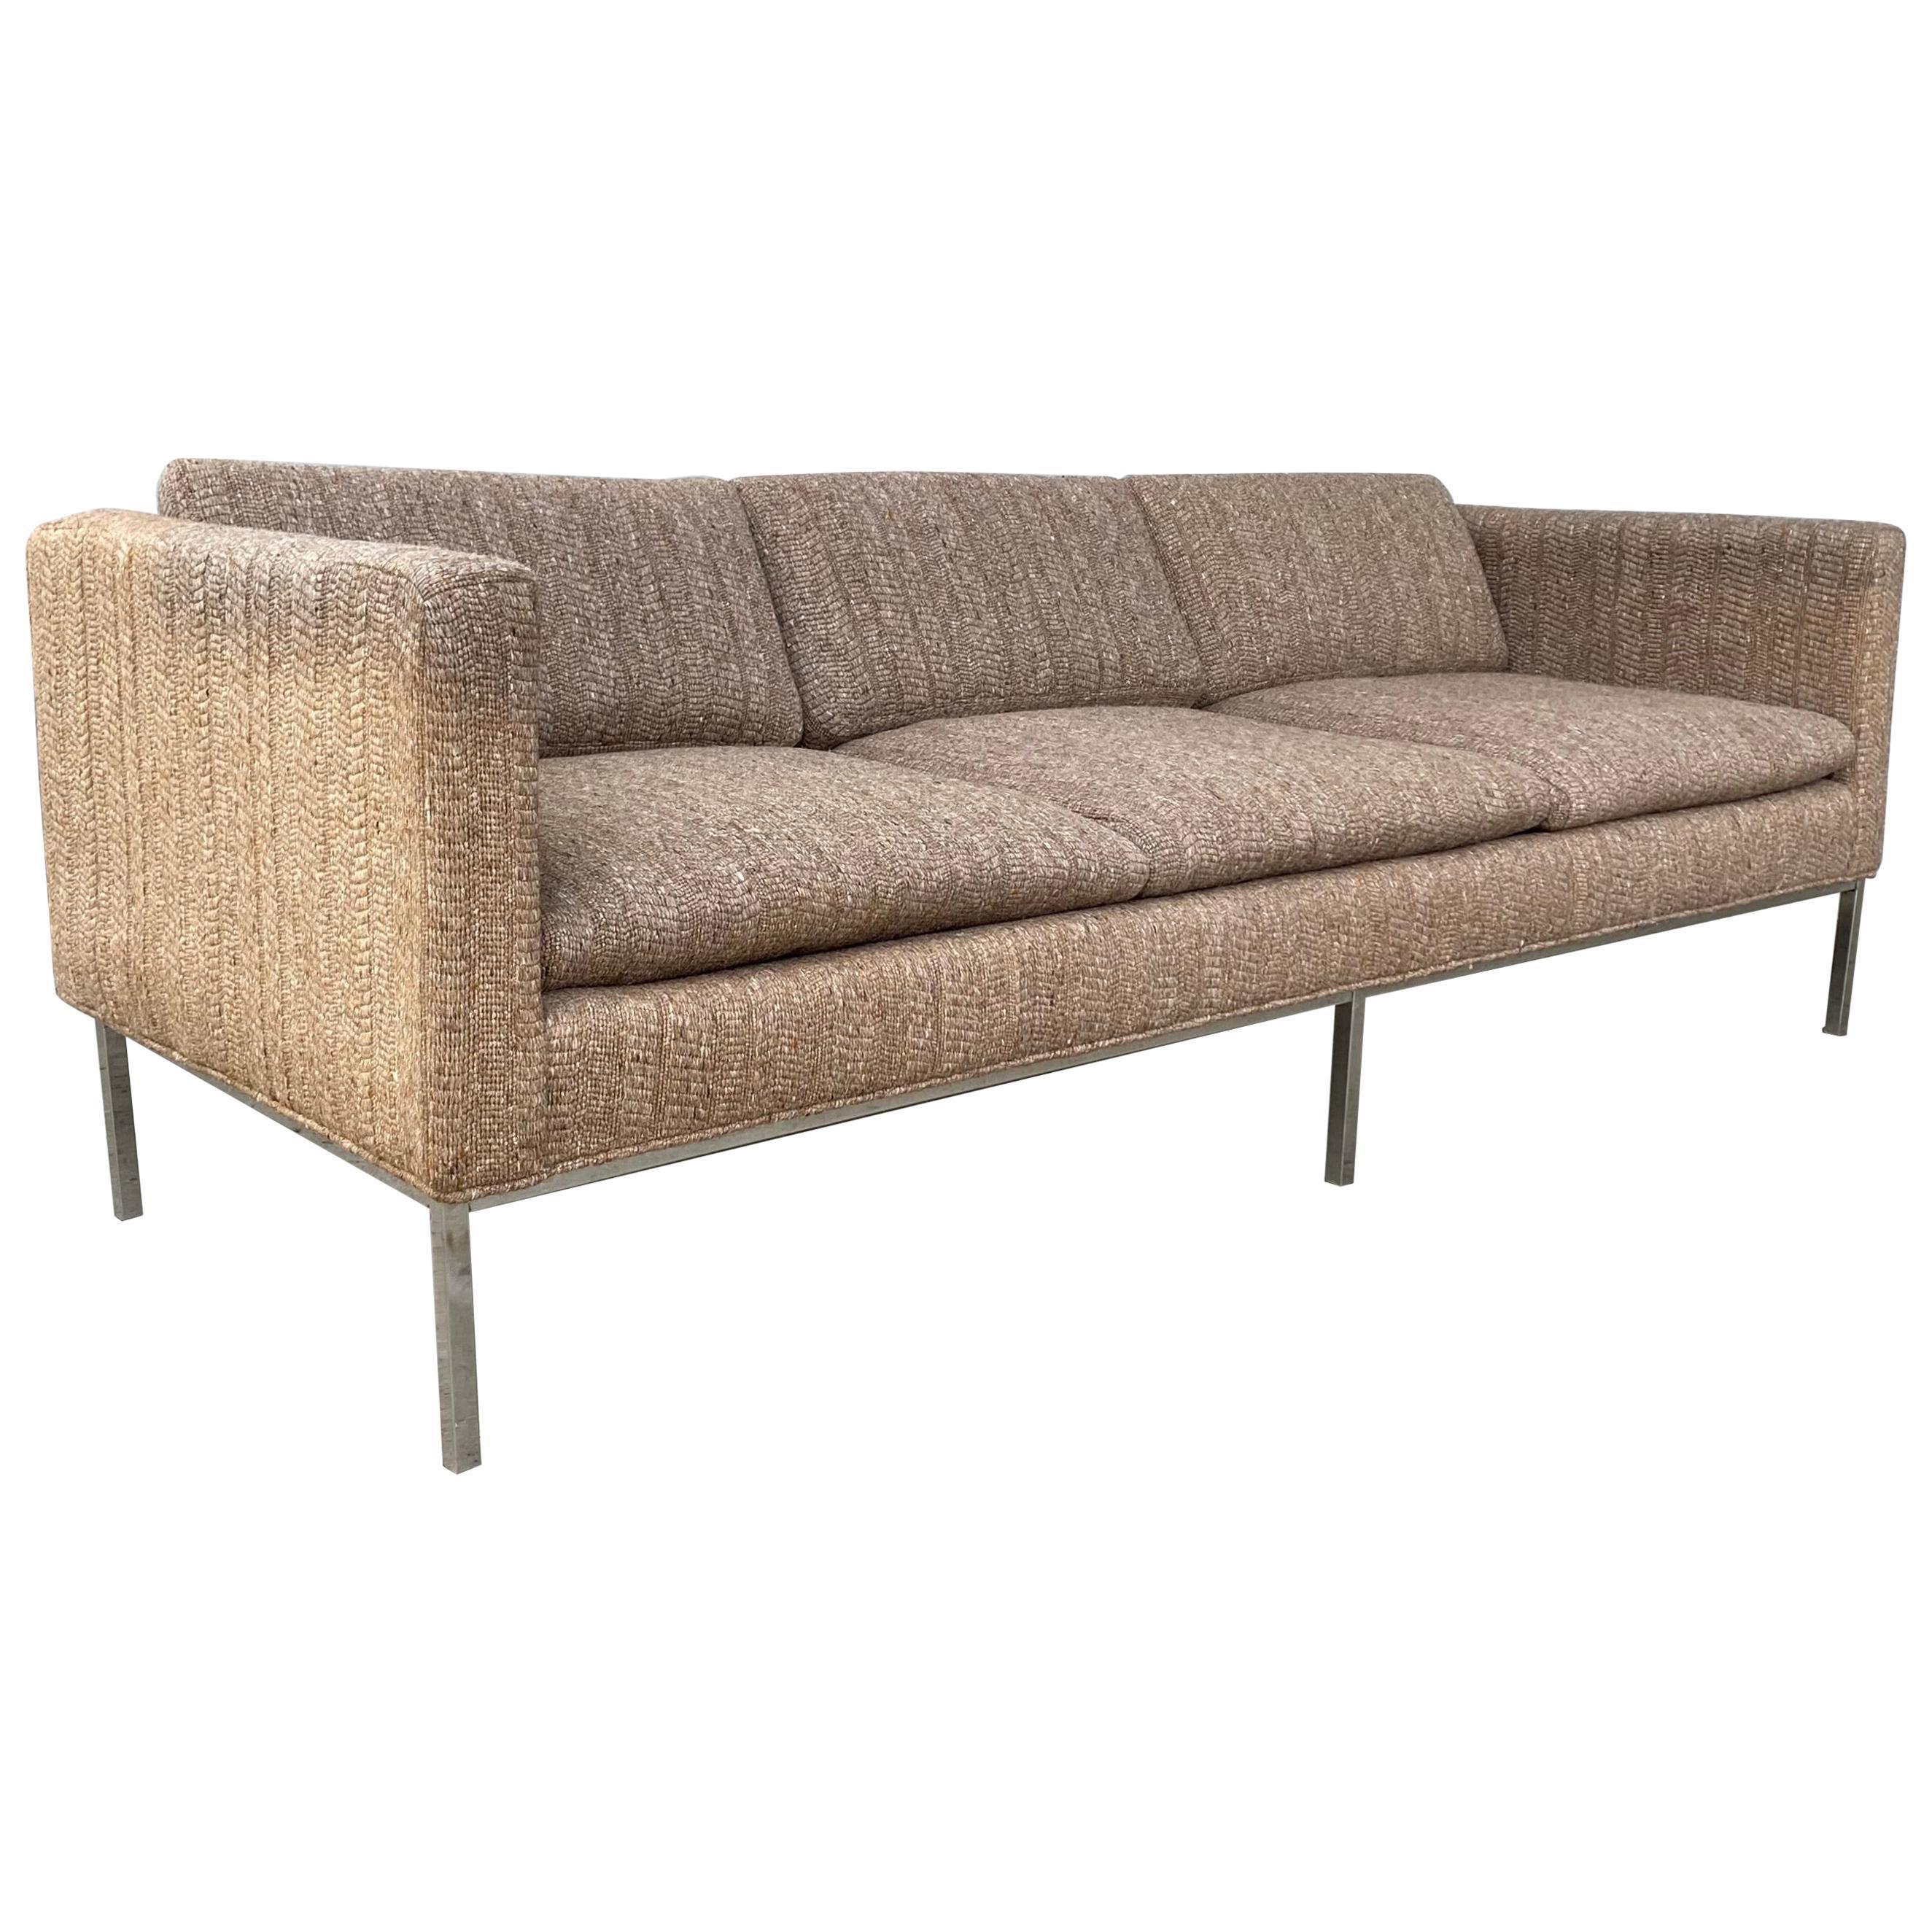 Milo Baughman Attributed Chrome Three-Seat Sofa, Mid-Century Modern